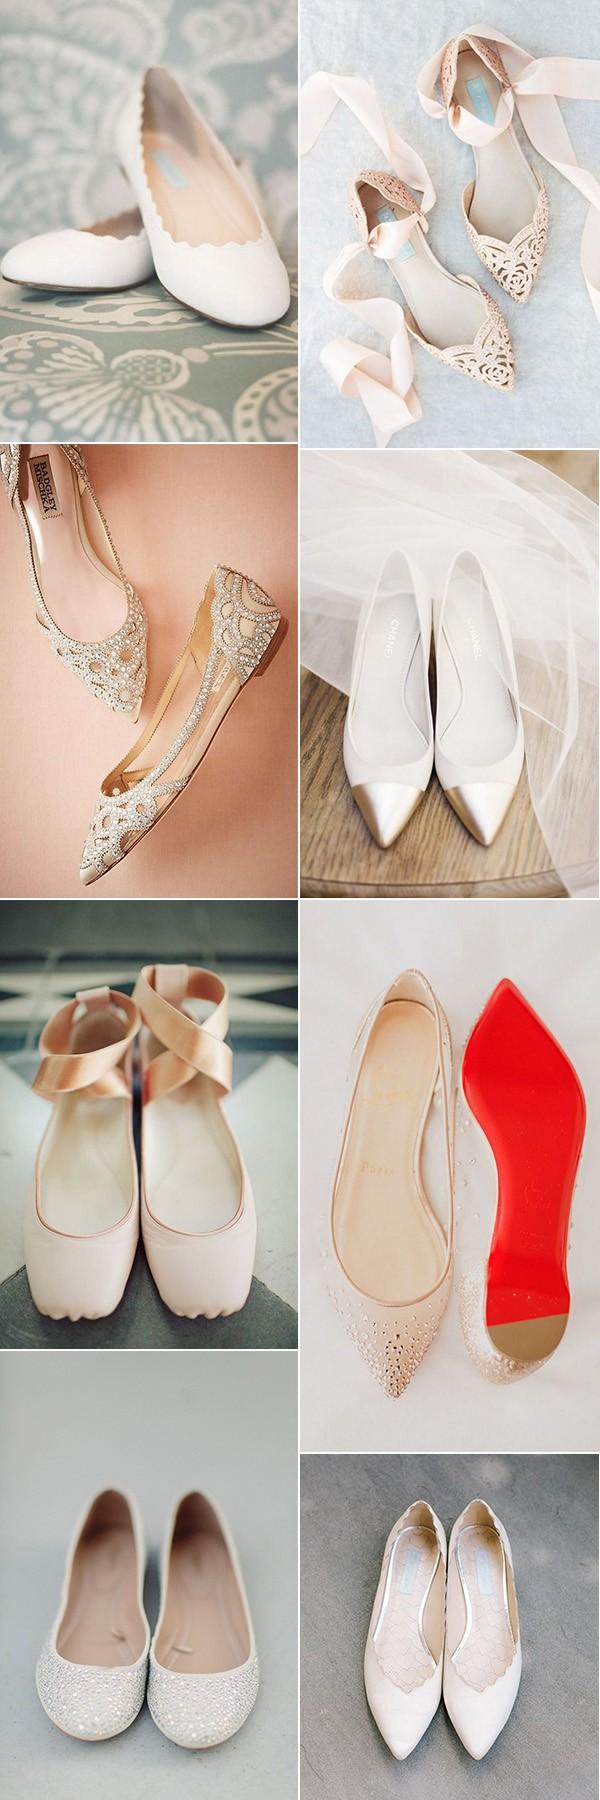 comfortable and stylish flat wedding shoes